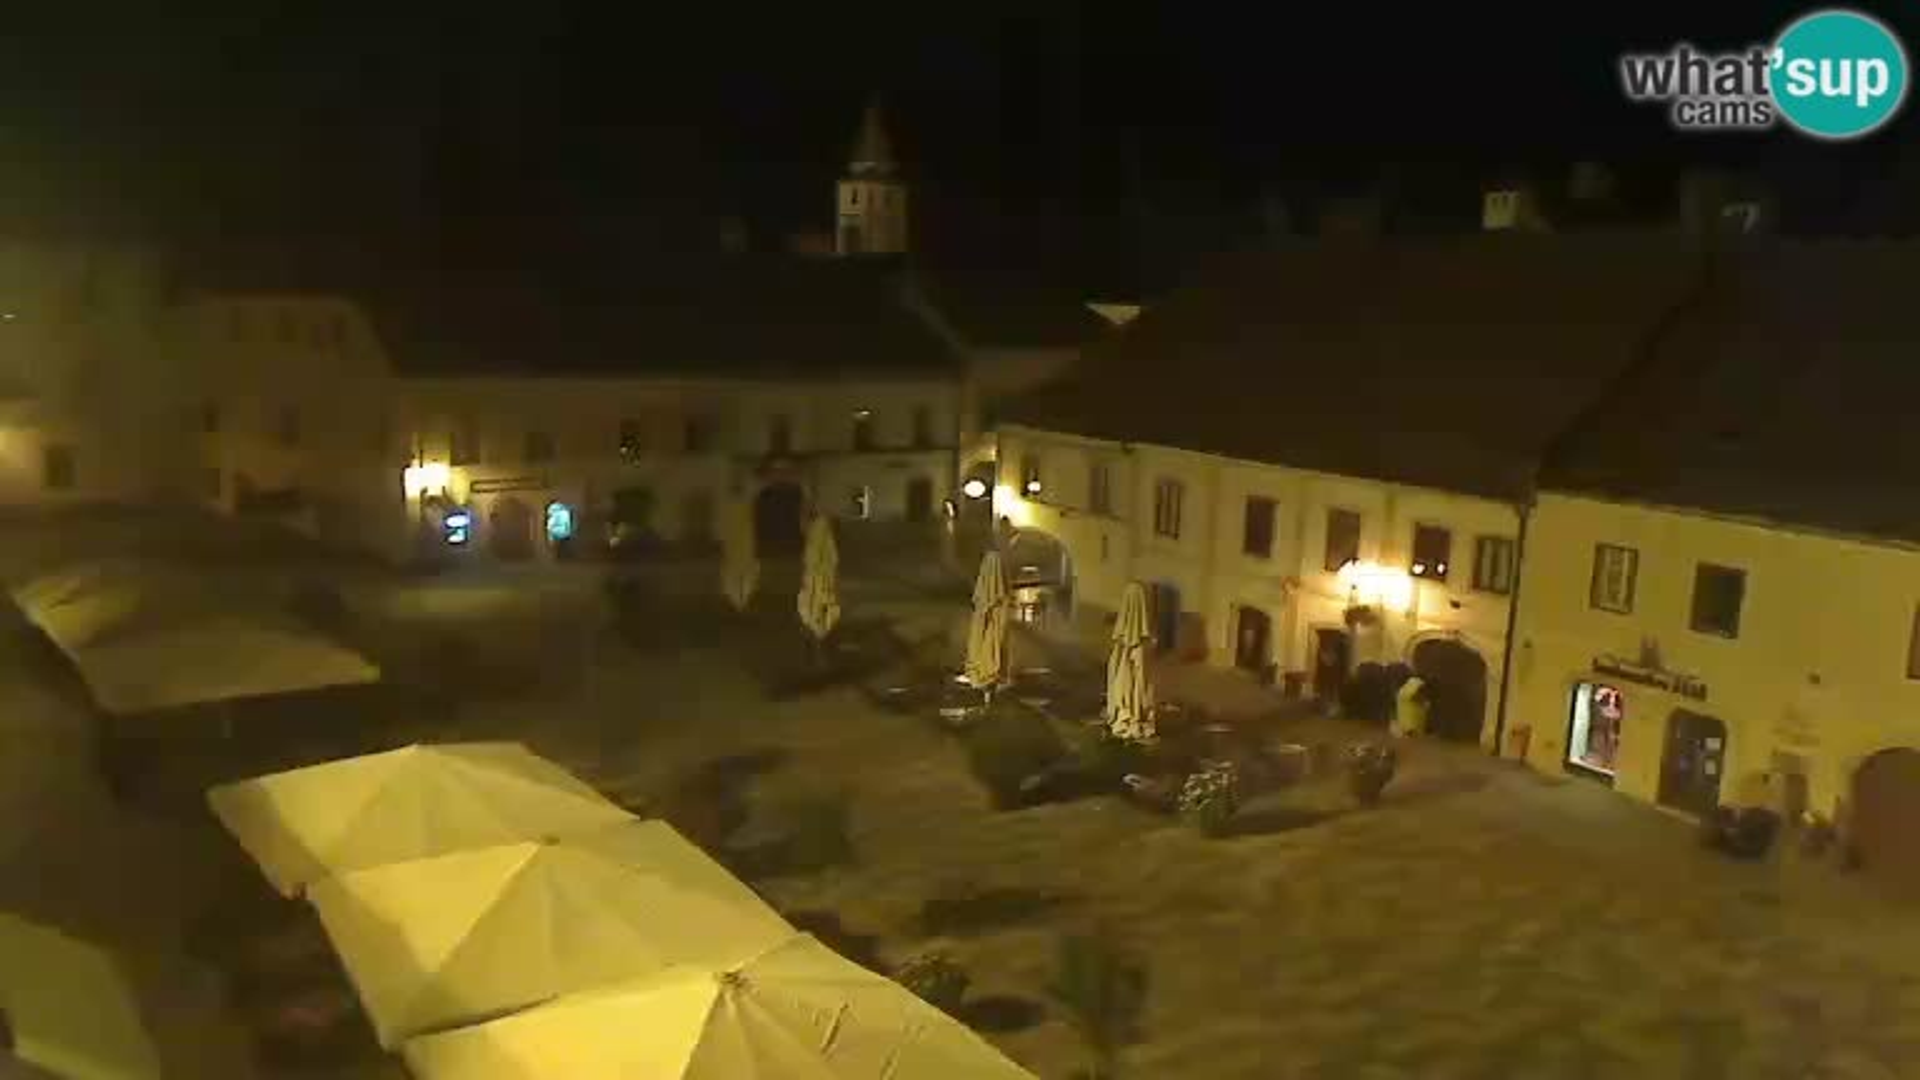 The King Tomislav square